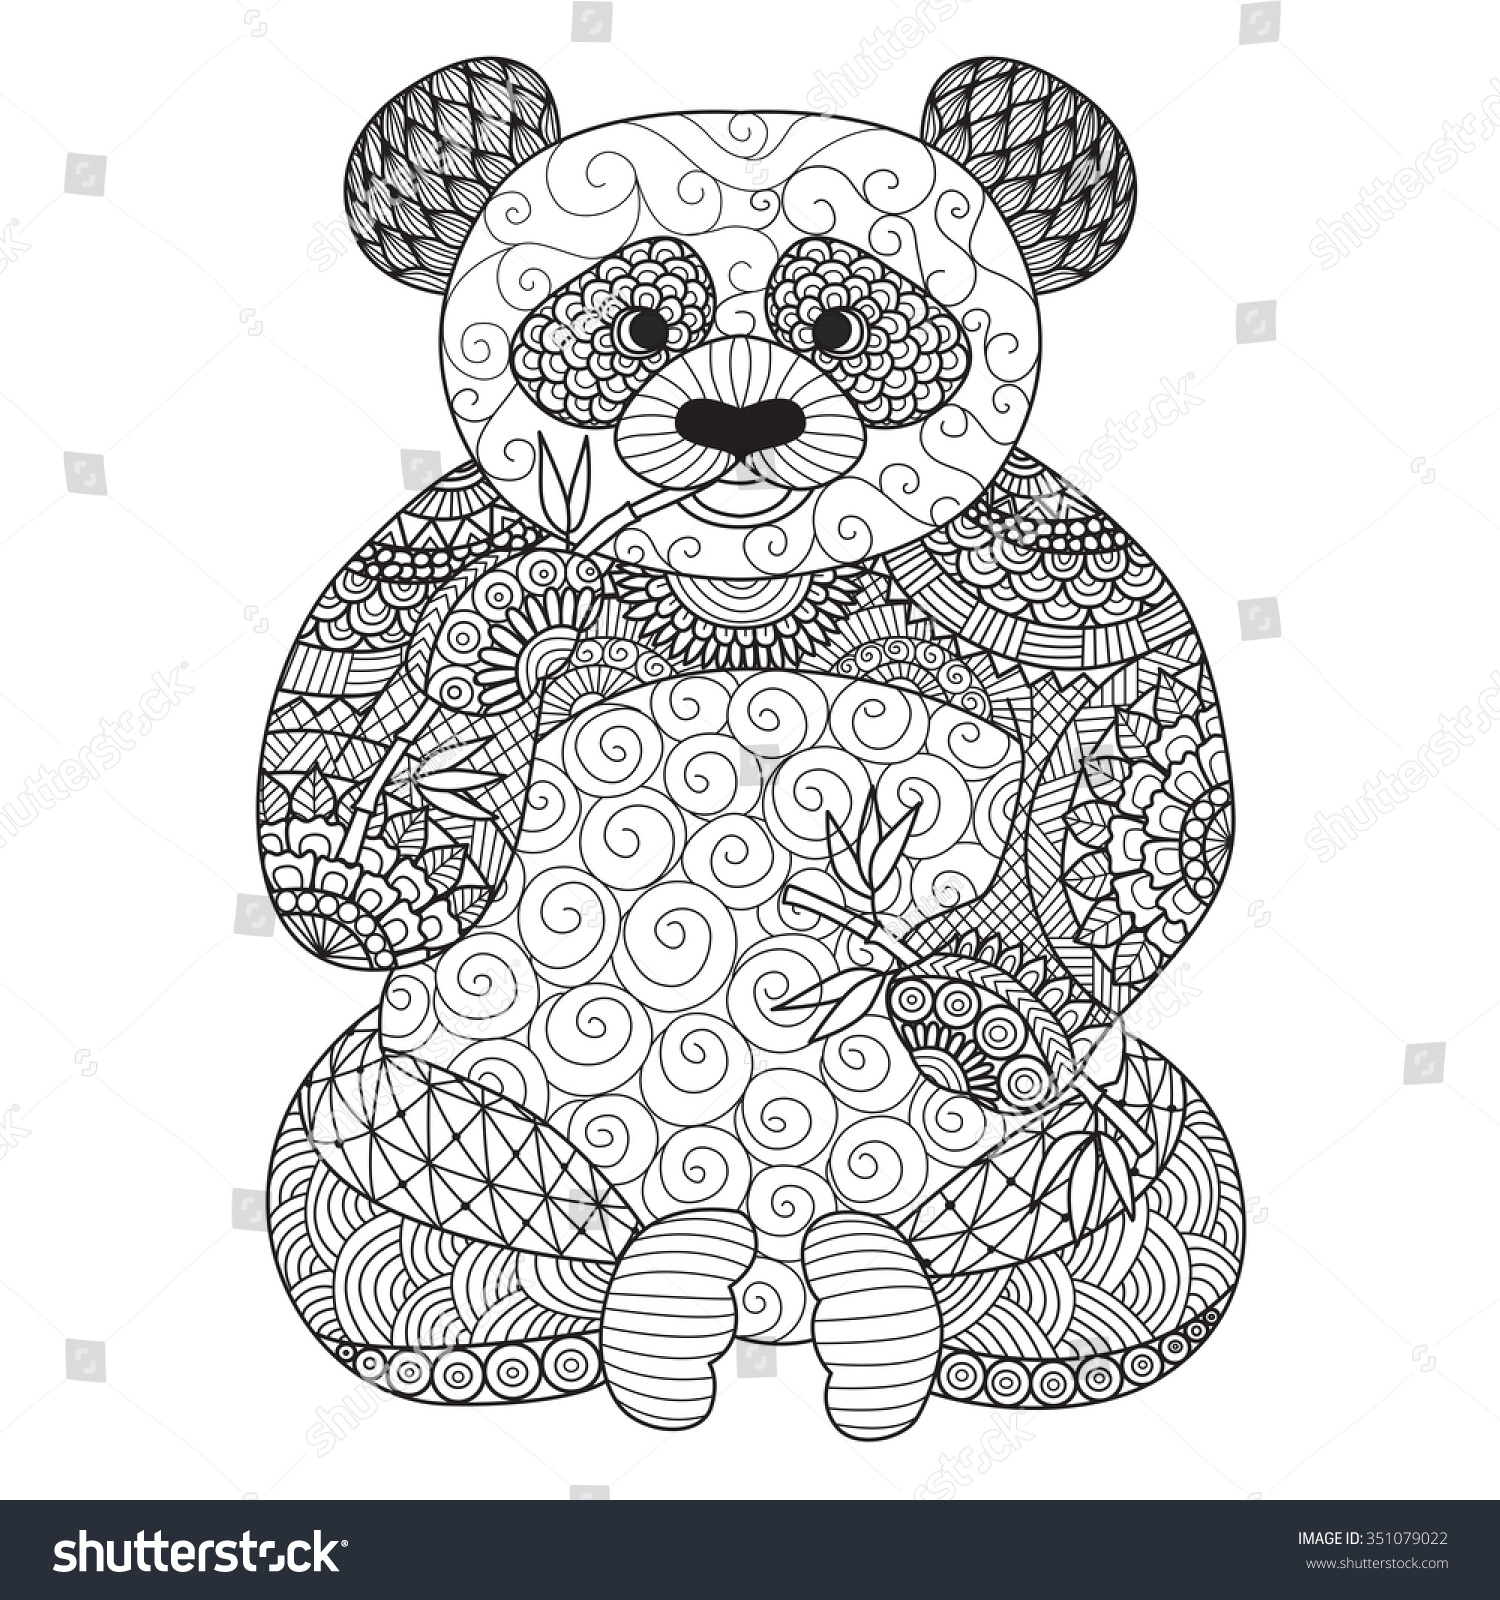 Shirt design book - Hand Drawn Zentangle Panda For Coloring Book For Adult Tattoo Shirt Design Logo